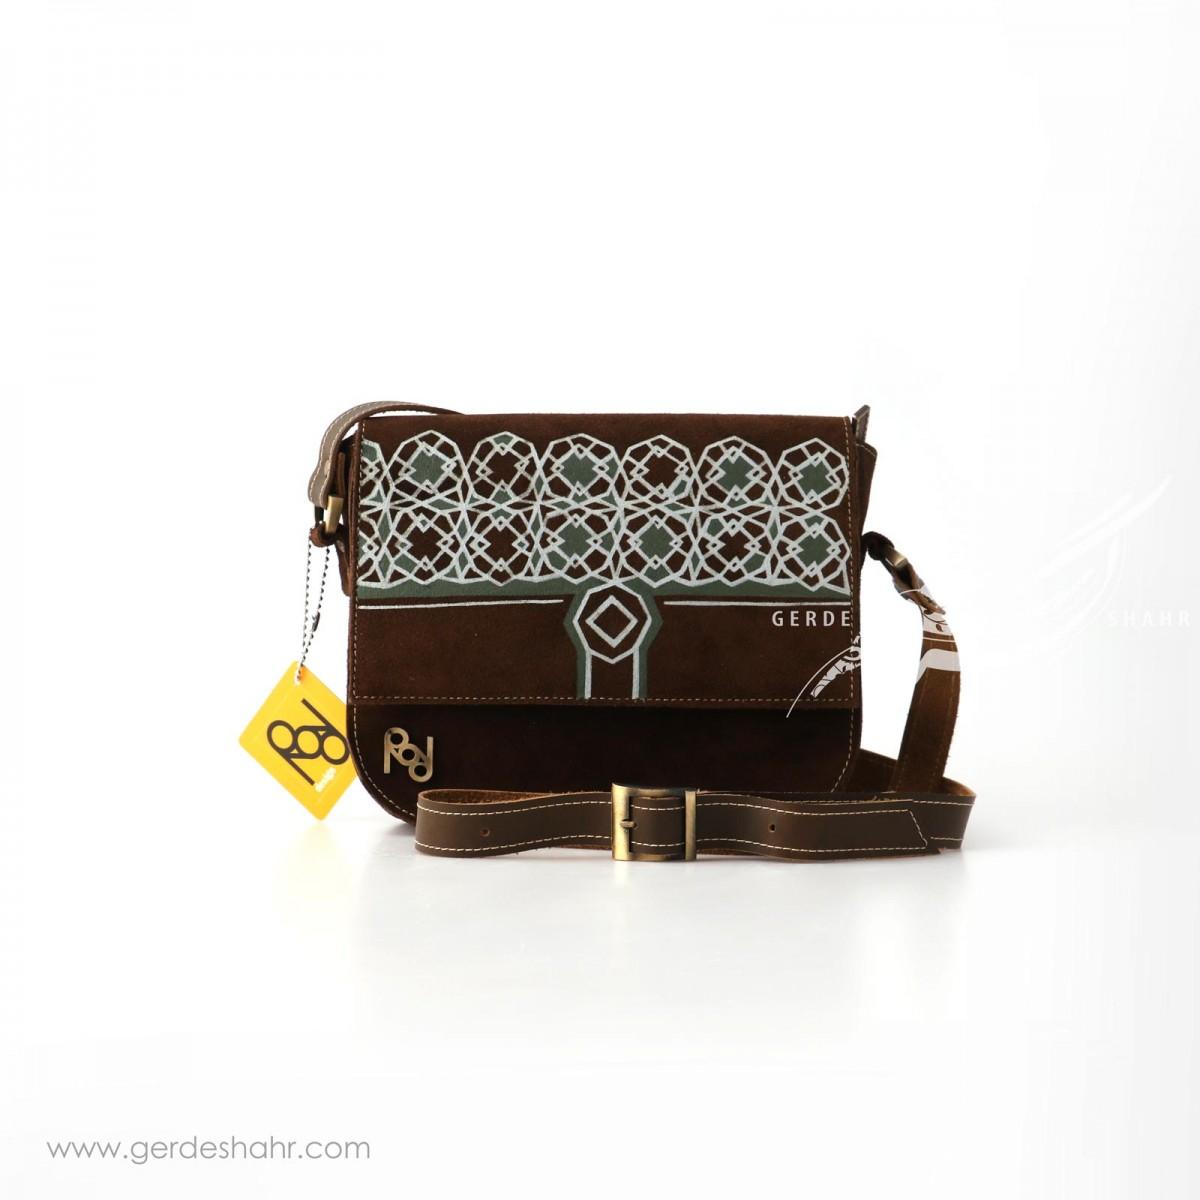 کیف چرم نقش قجری رد گنجه رخت